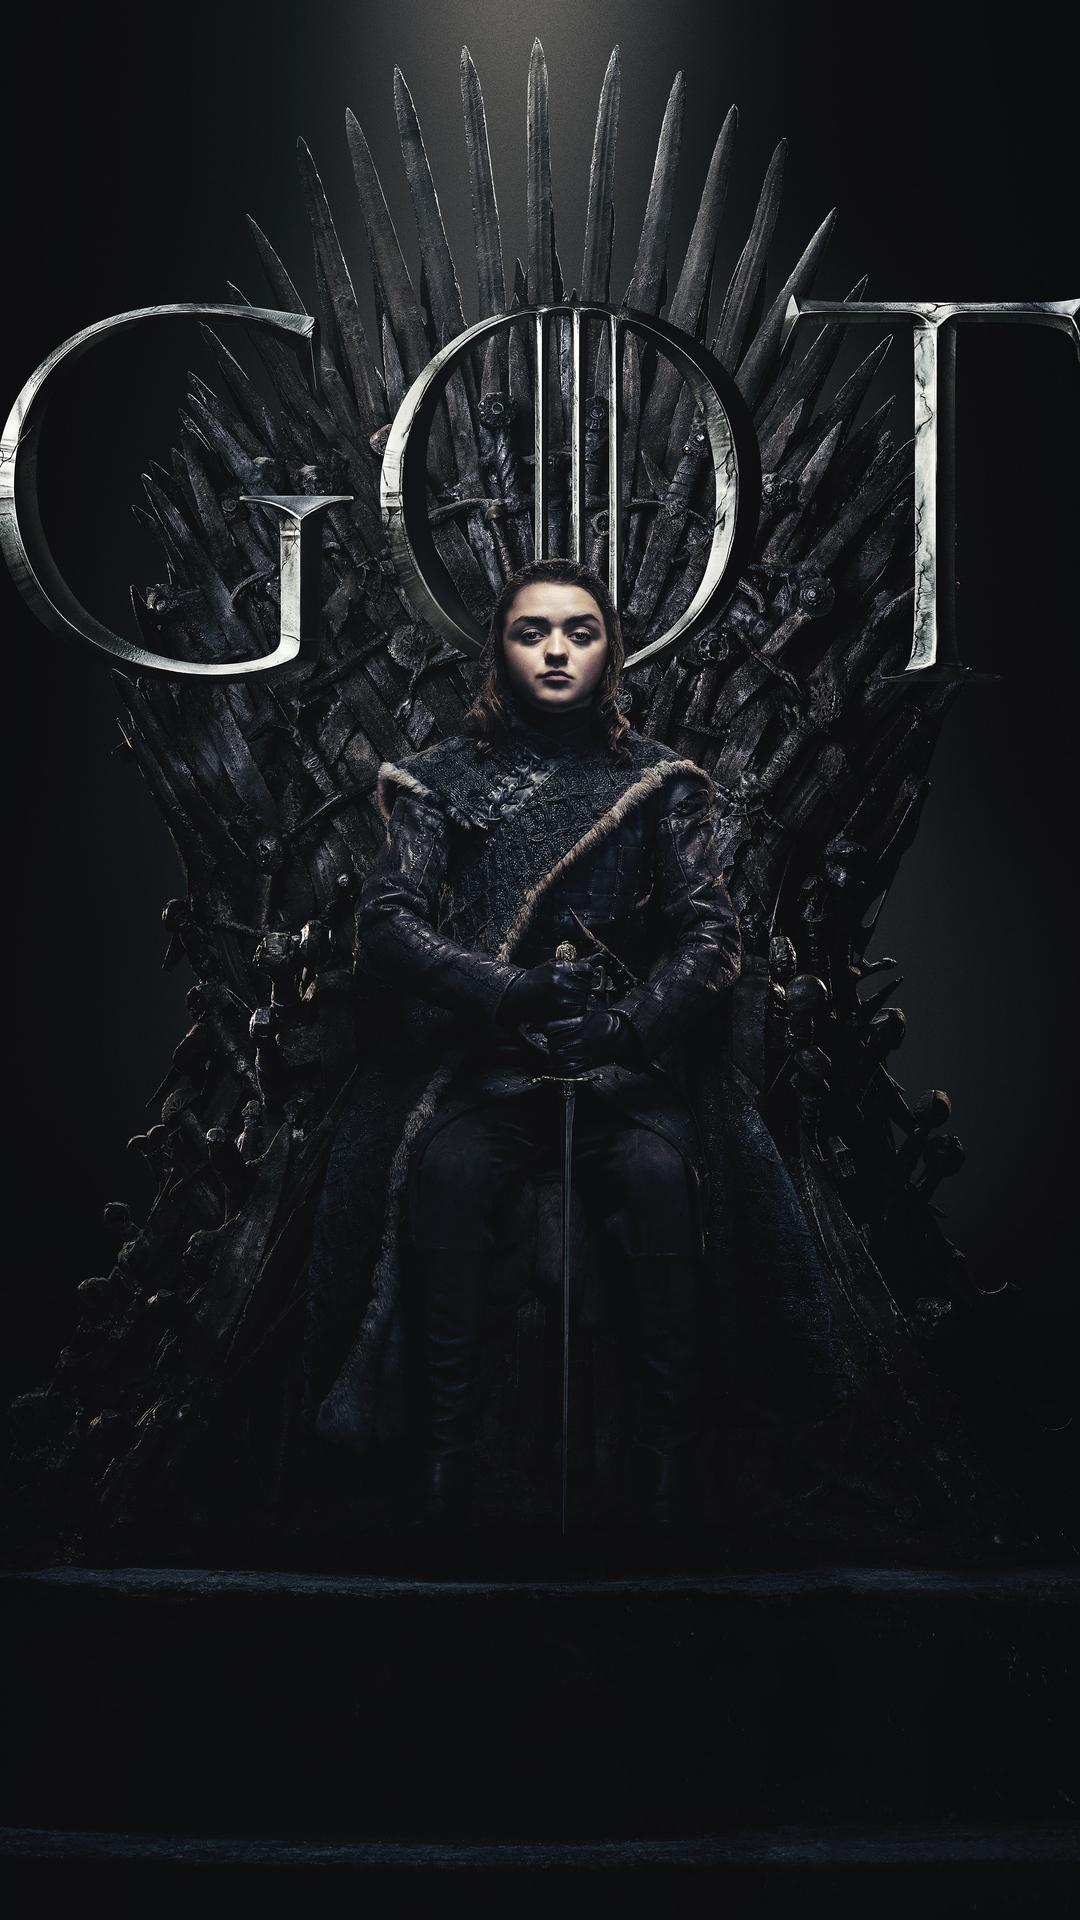 1080x1920 Arya Stark Game Of Thrones Season 8 Poster Iphone 76s6